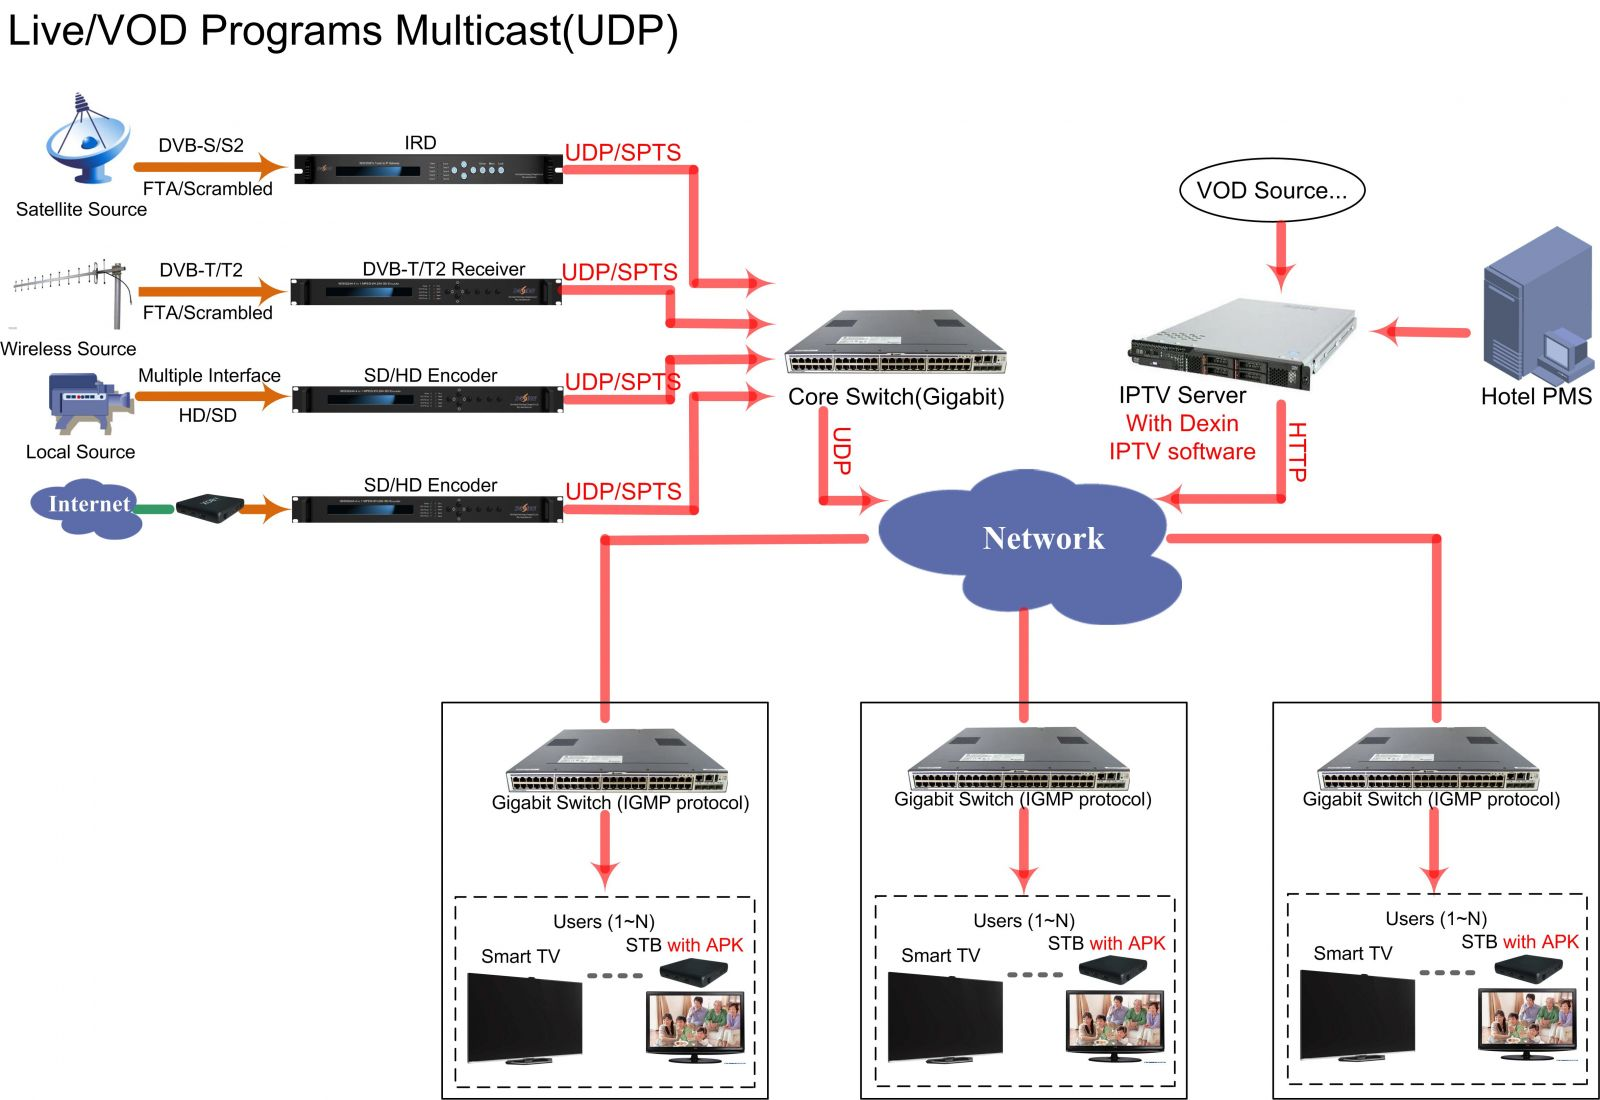 Dexin Iptv Hd Stb Digital Technology Corp Ltd Wiring Diagram Advantages